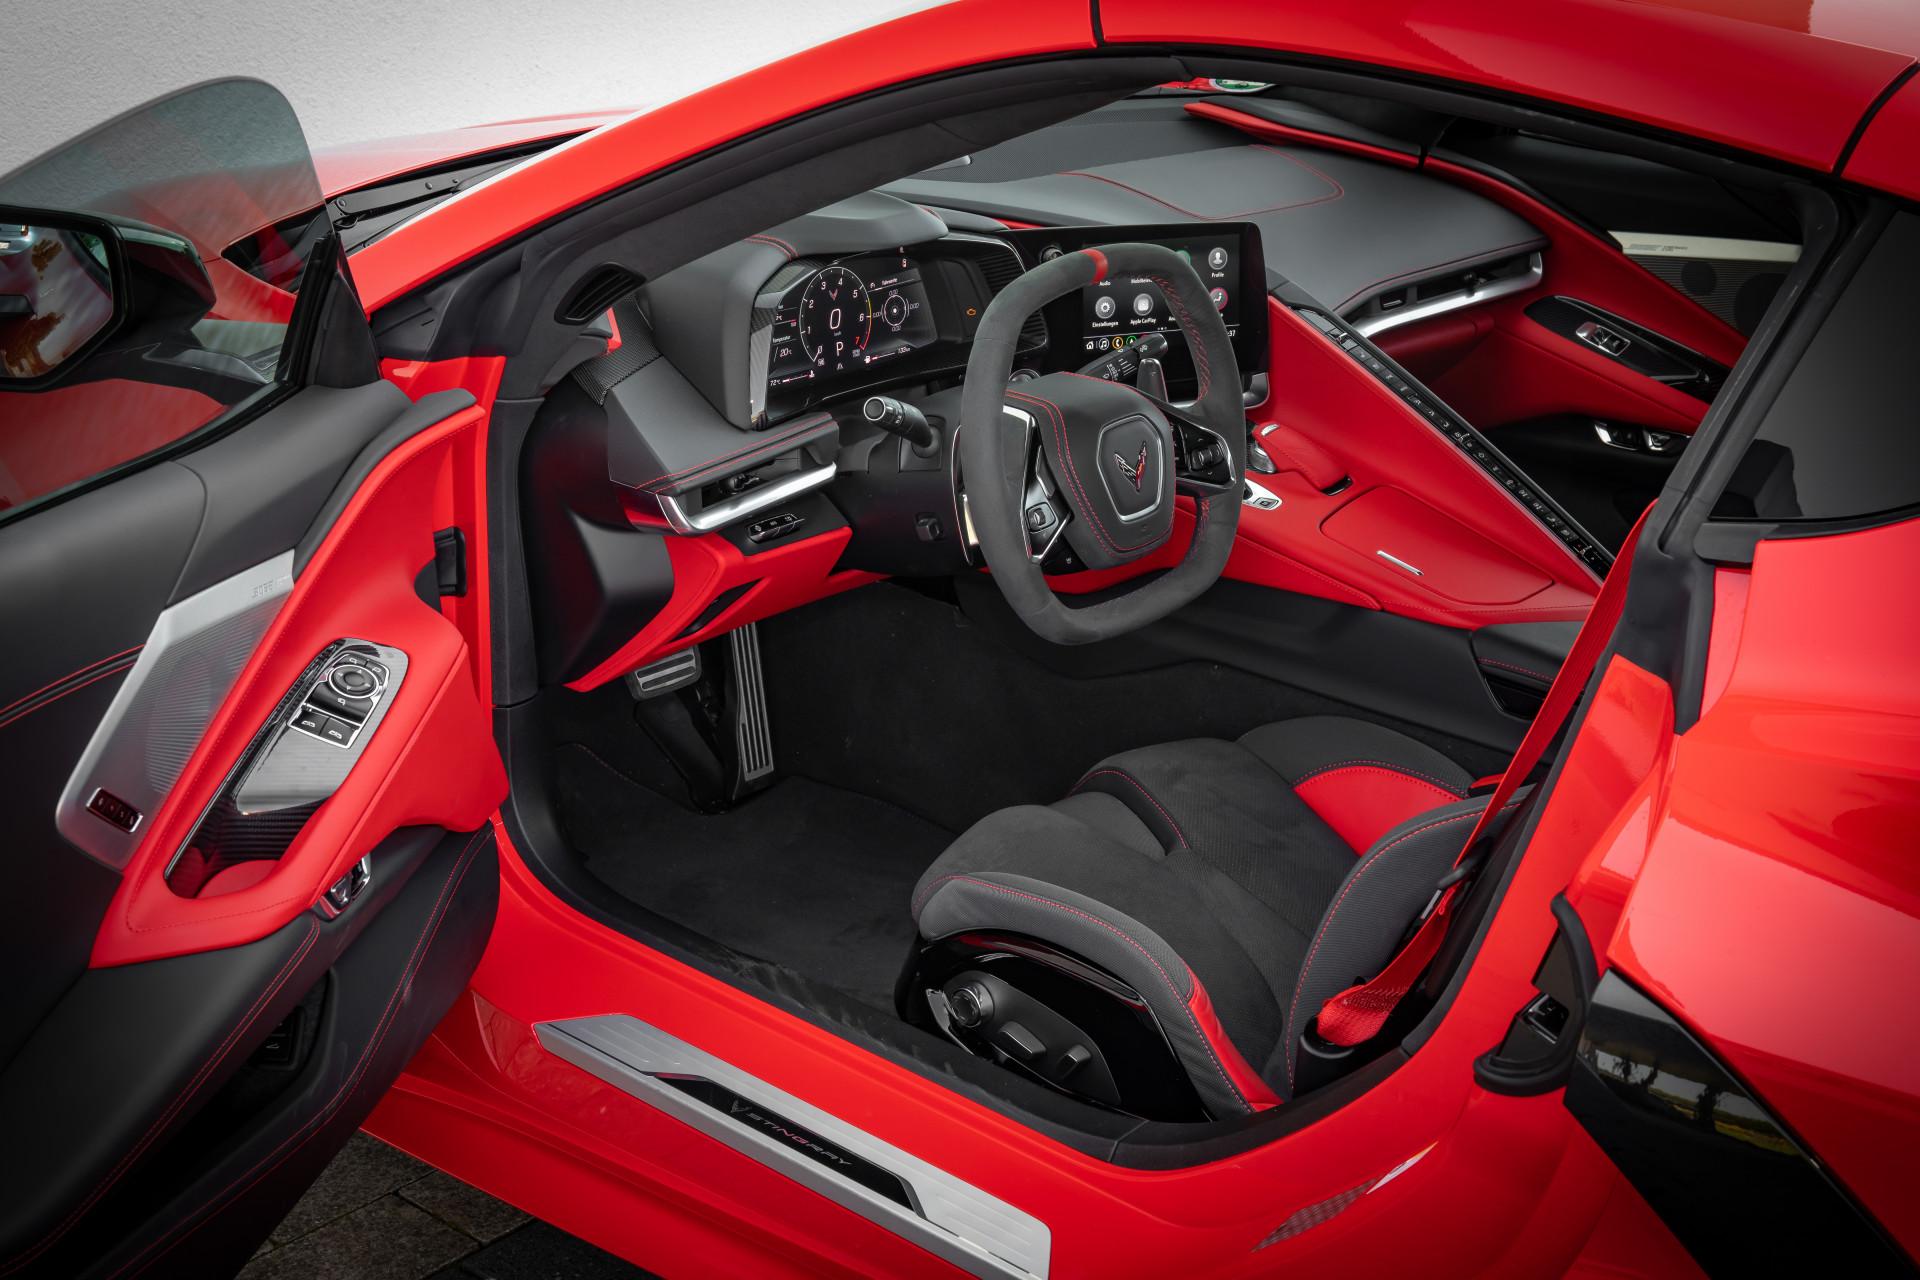 2021 Corvette C8 Stingray